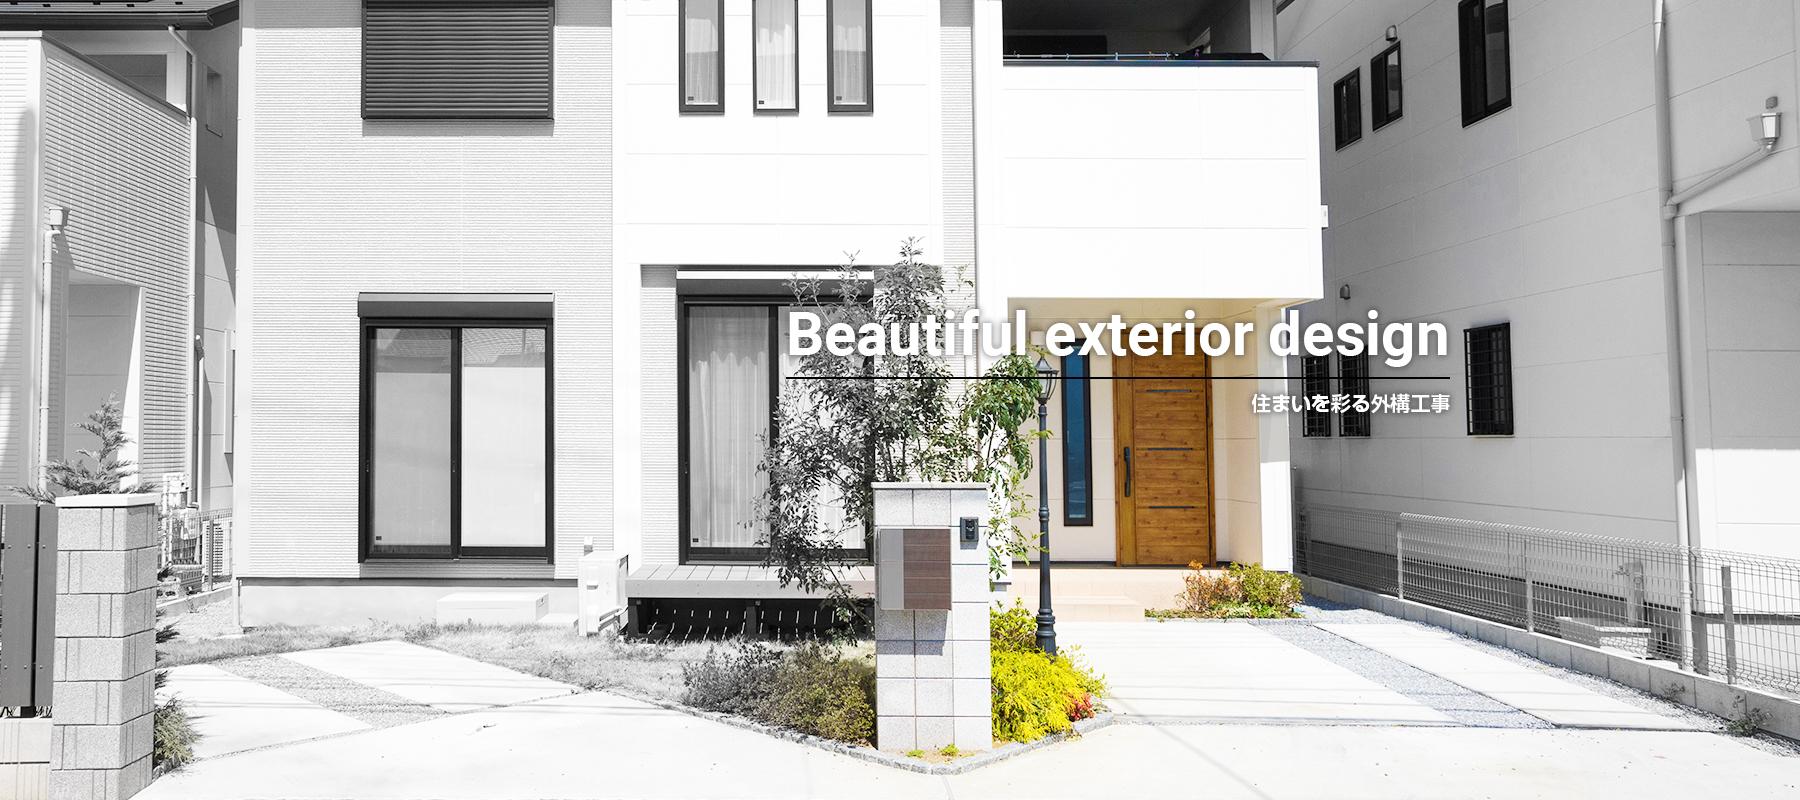 HOME | 外構・エクステリアは茅野市の株式会社大翔建設へ【作業員募集中】